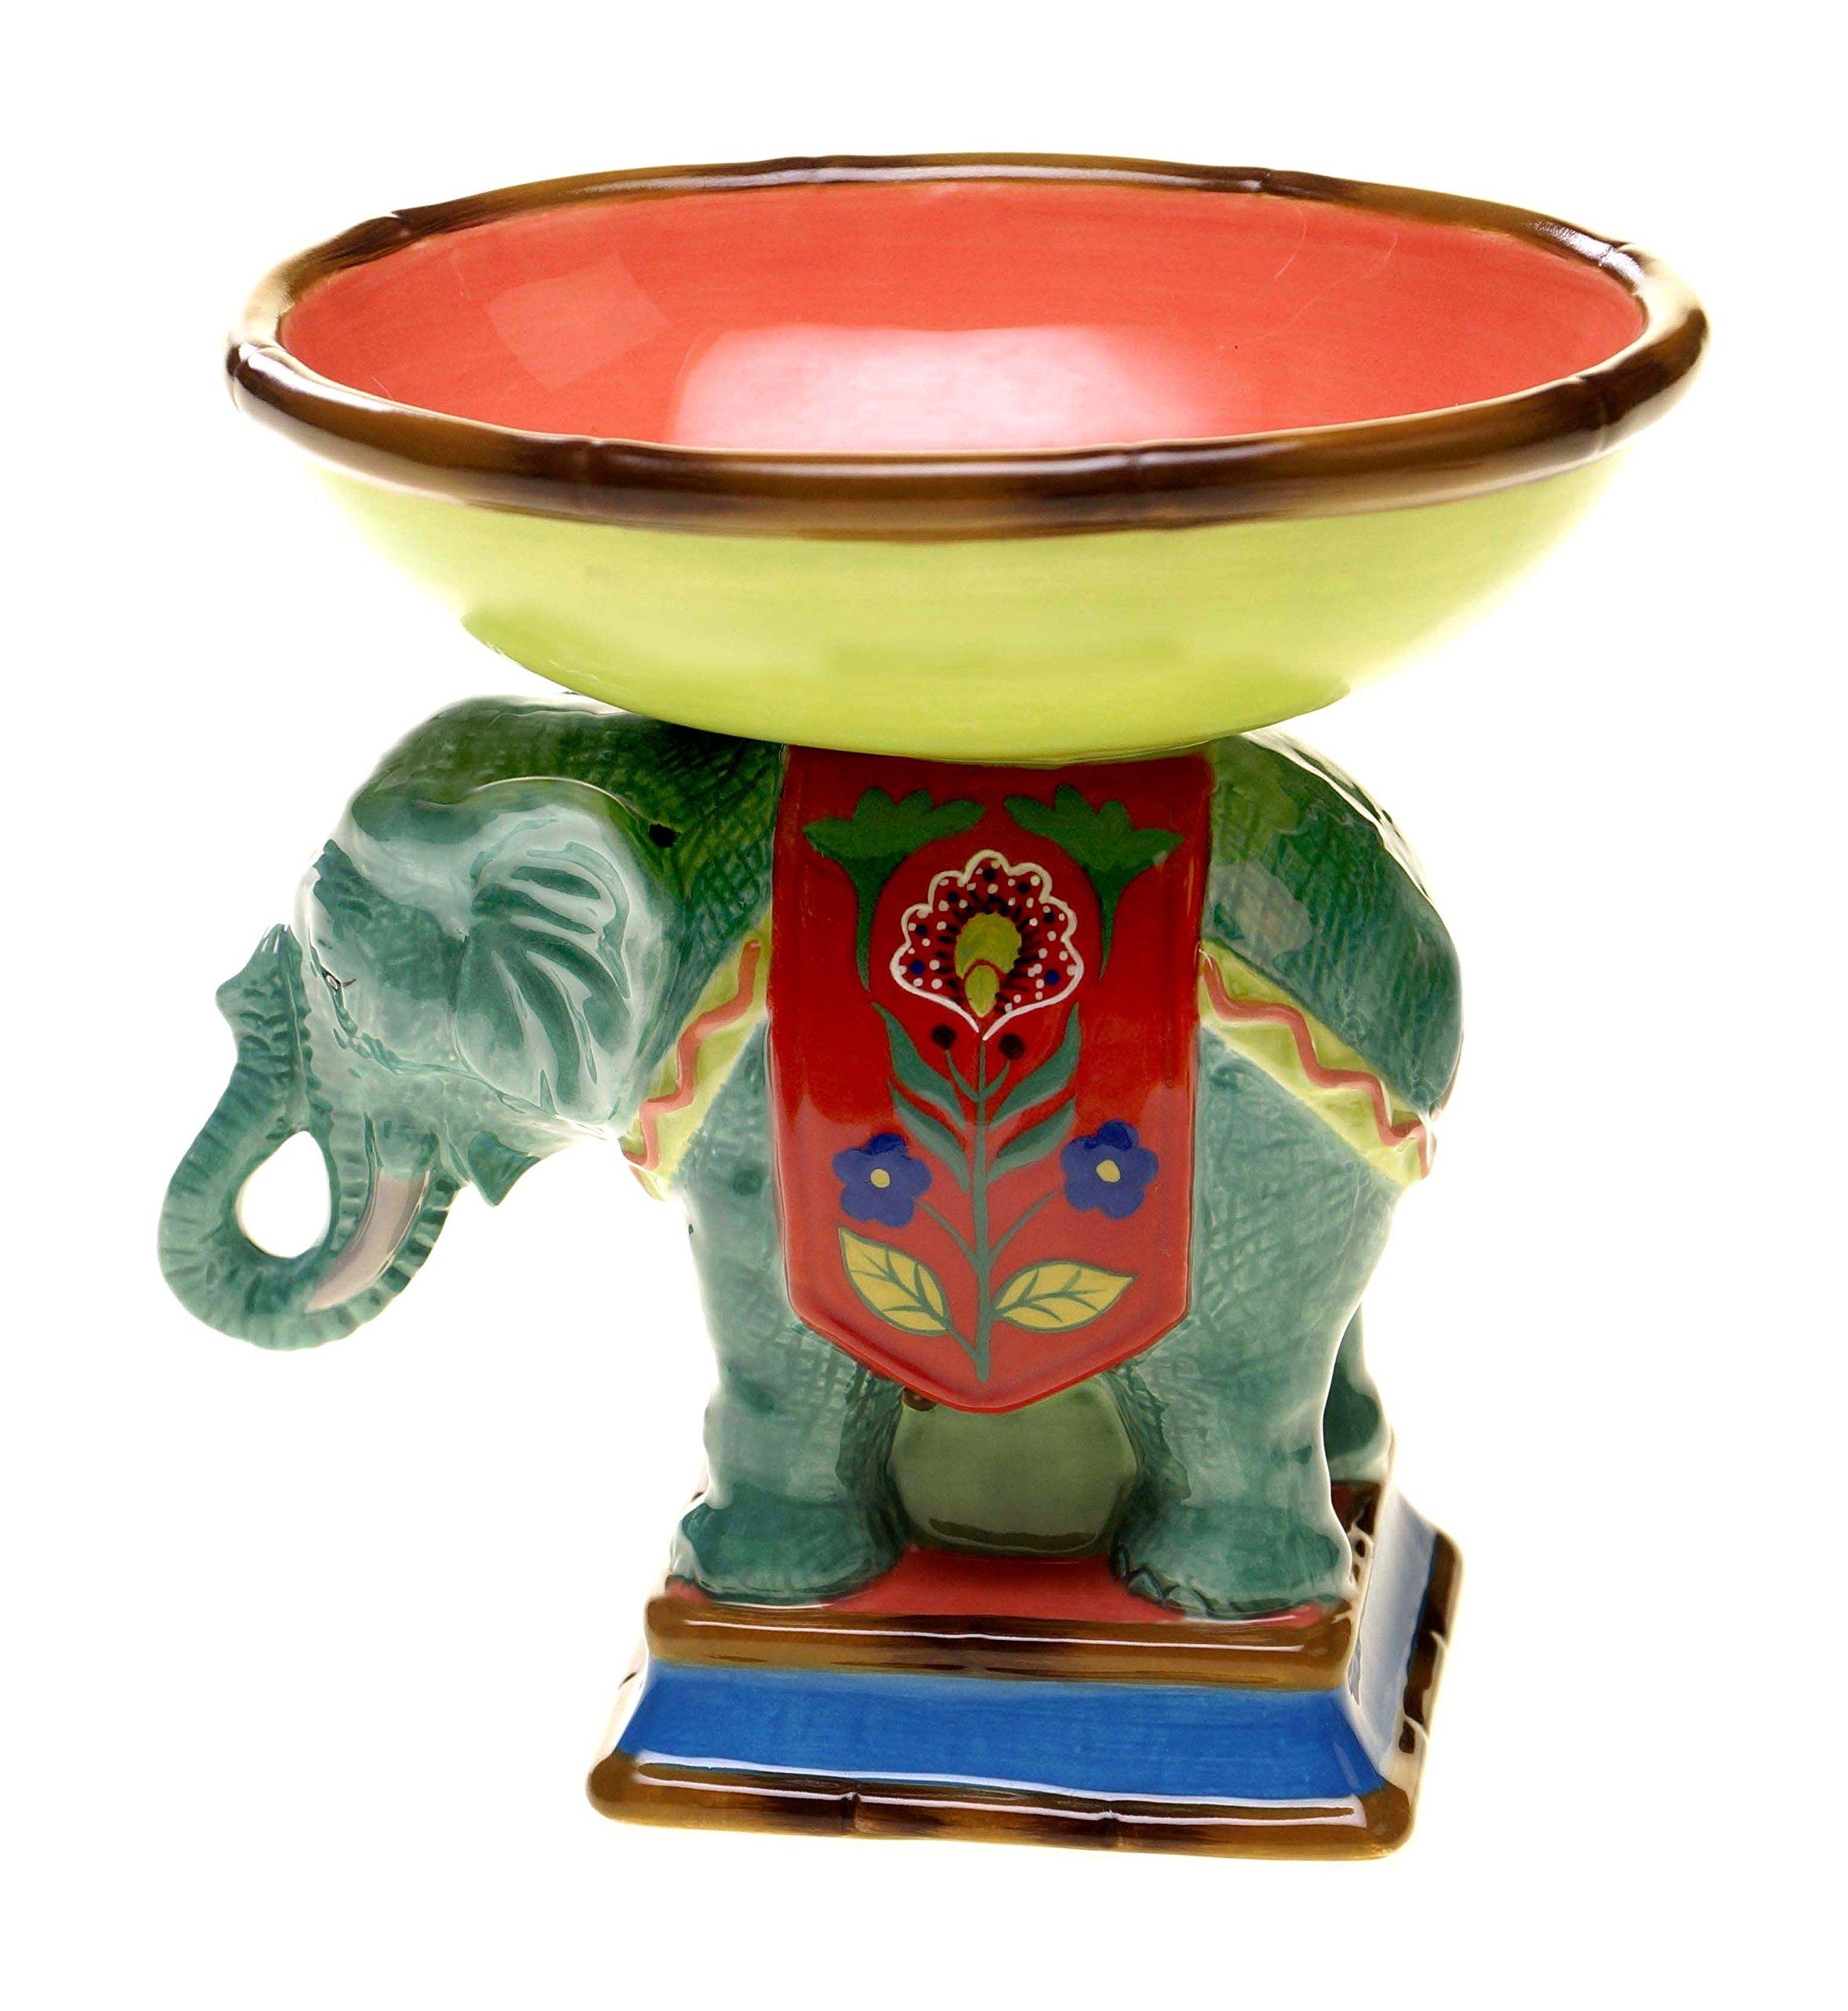 Tracy Porter for Poetic Wanderlust Eden Ranch 3-D Elephant Pedestal Bowl